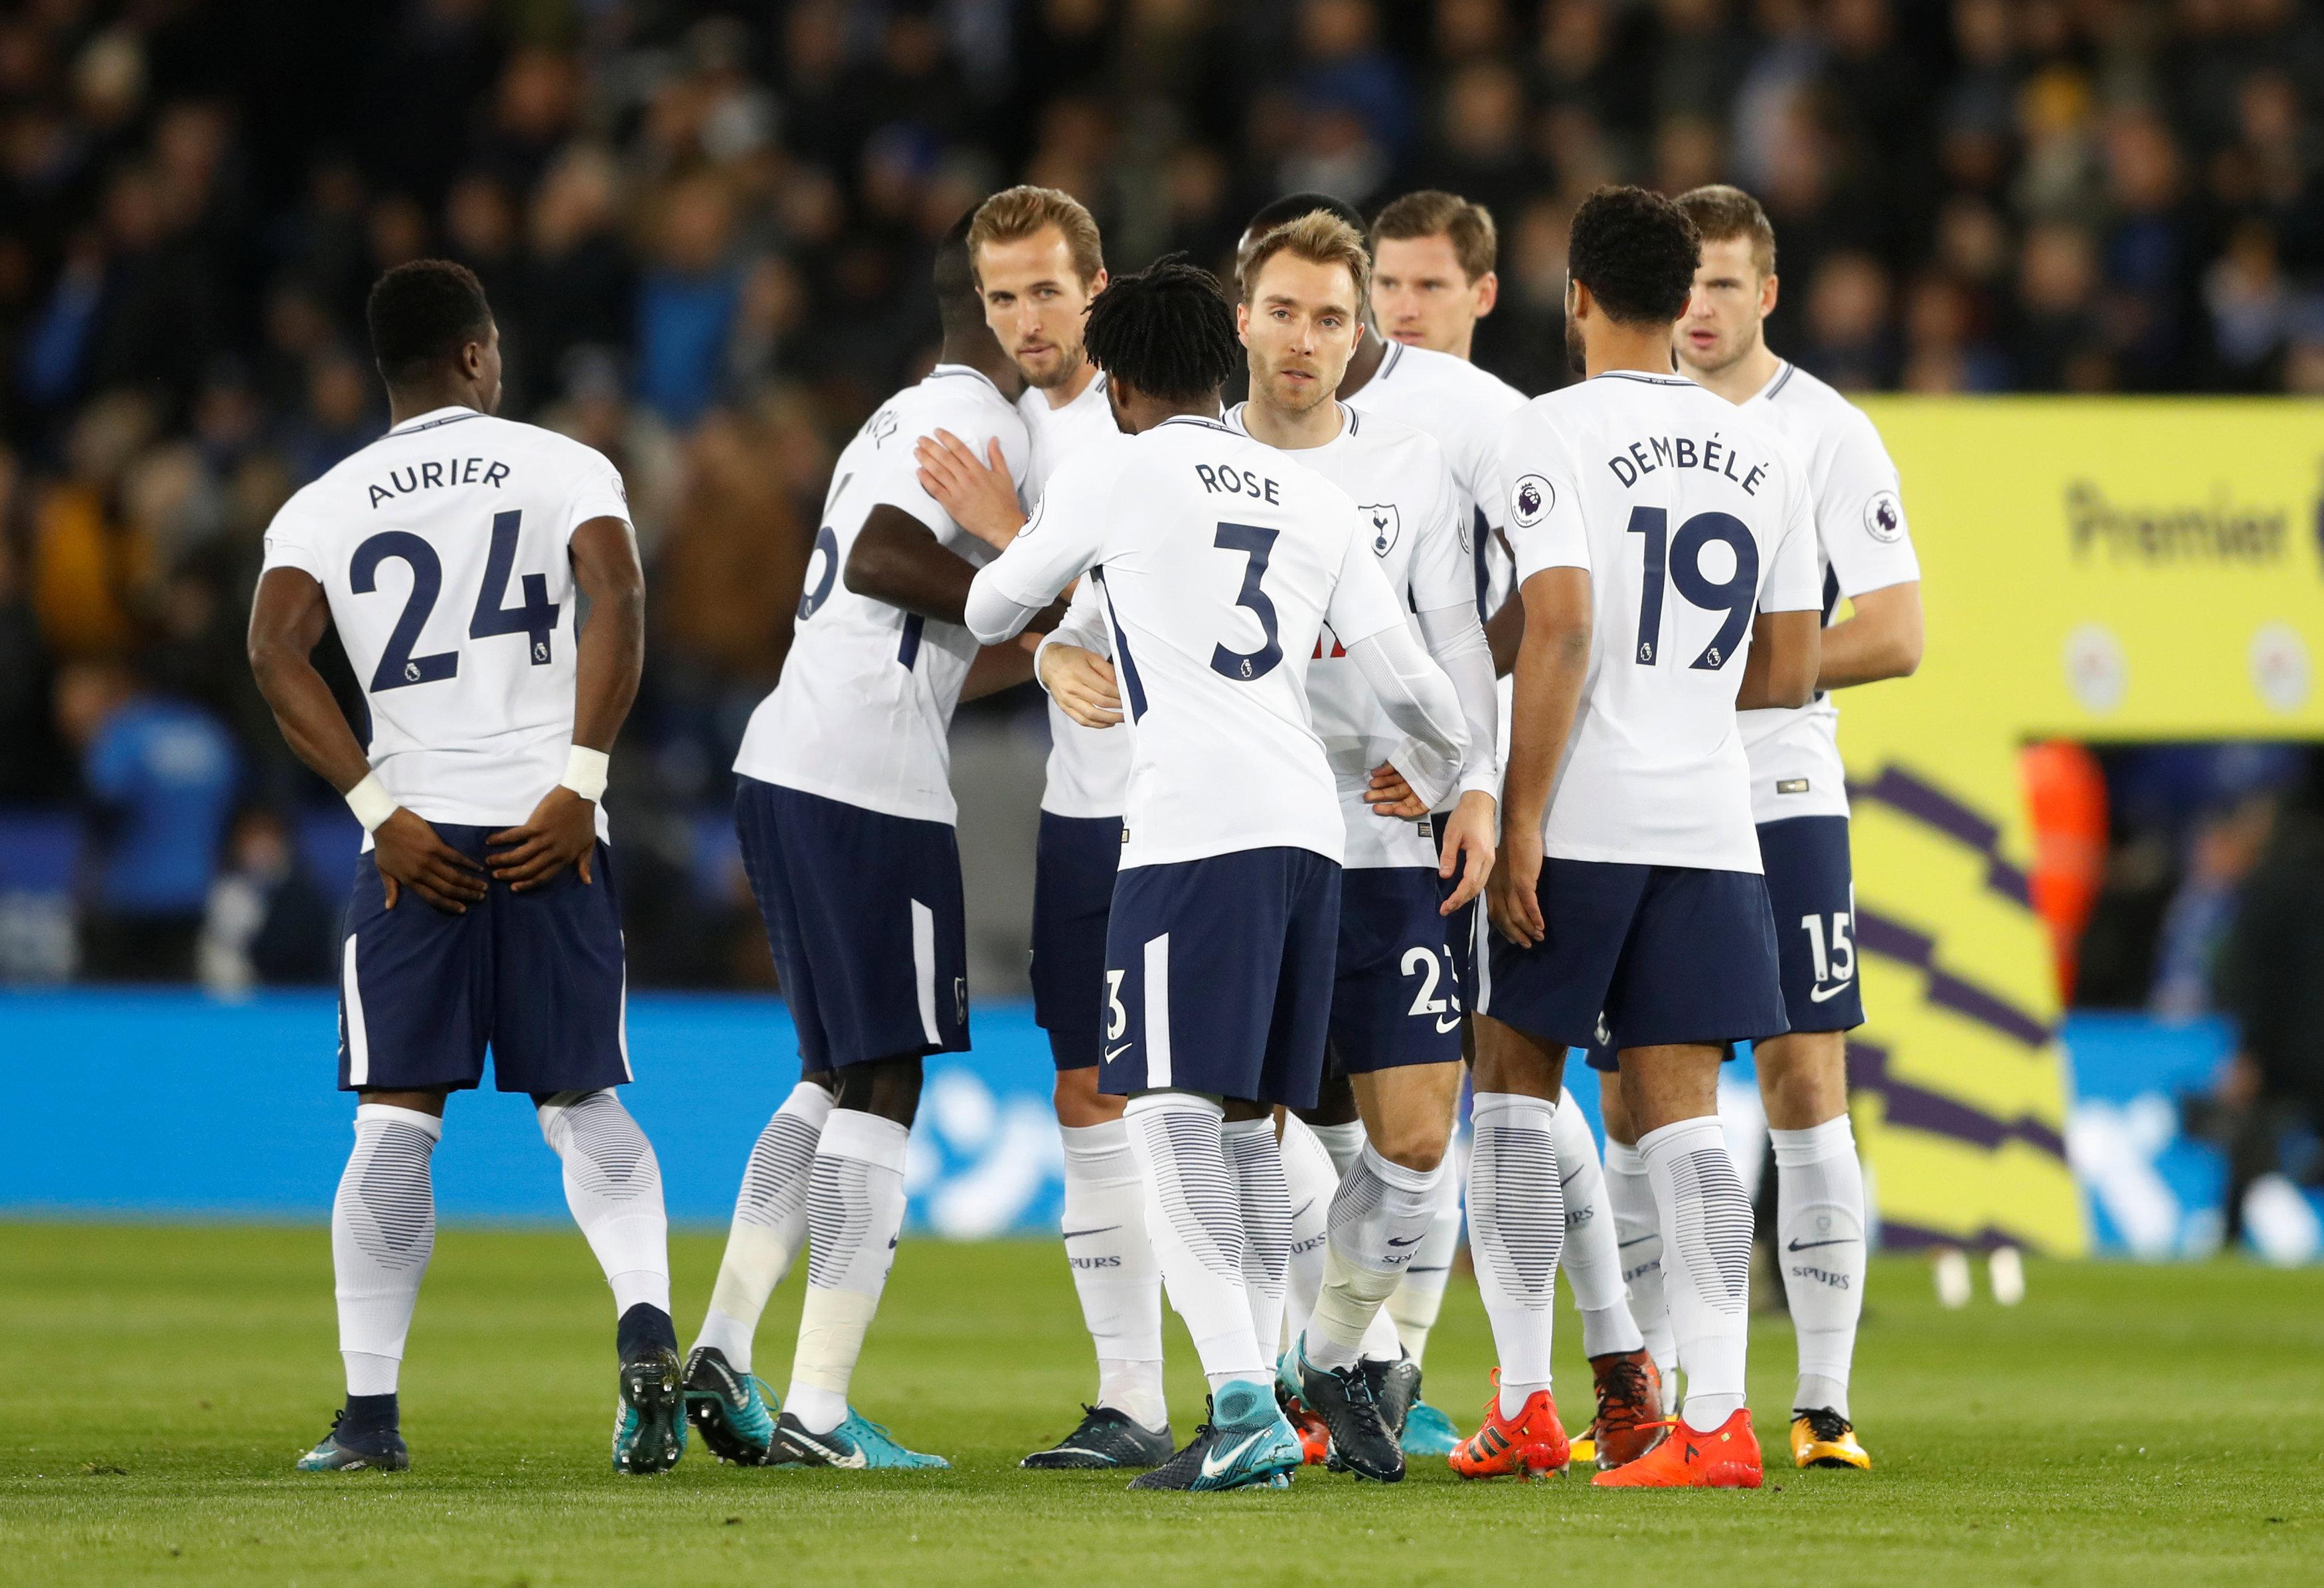 Tottenham Champions League Squad 2018